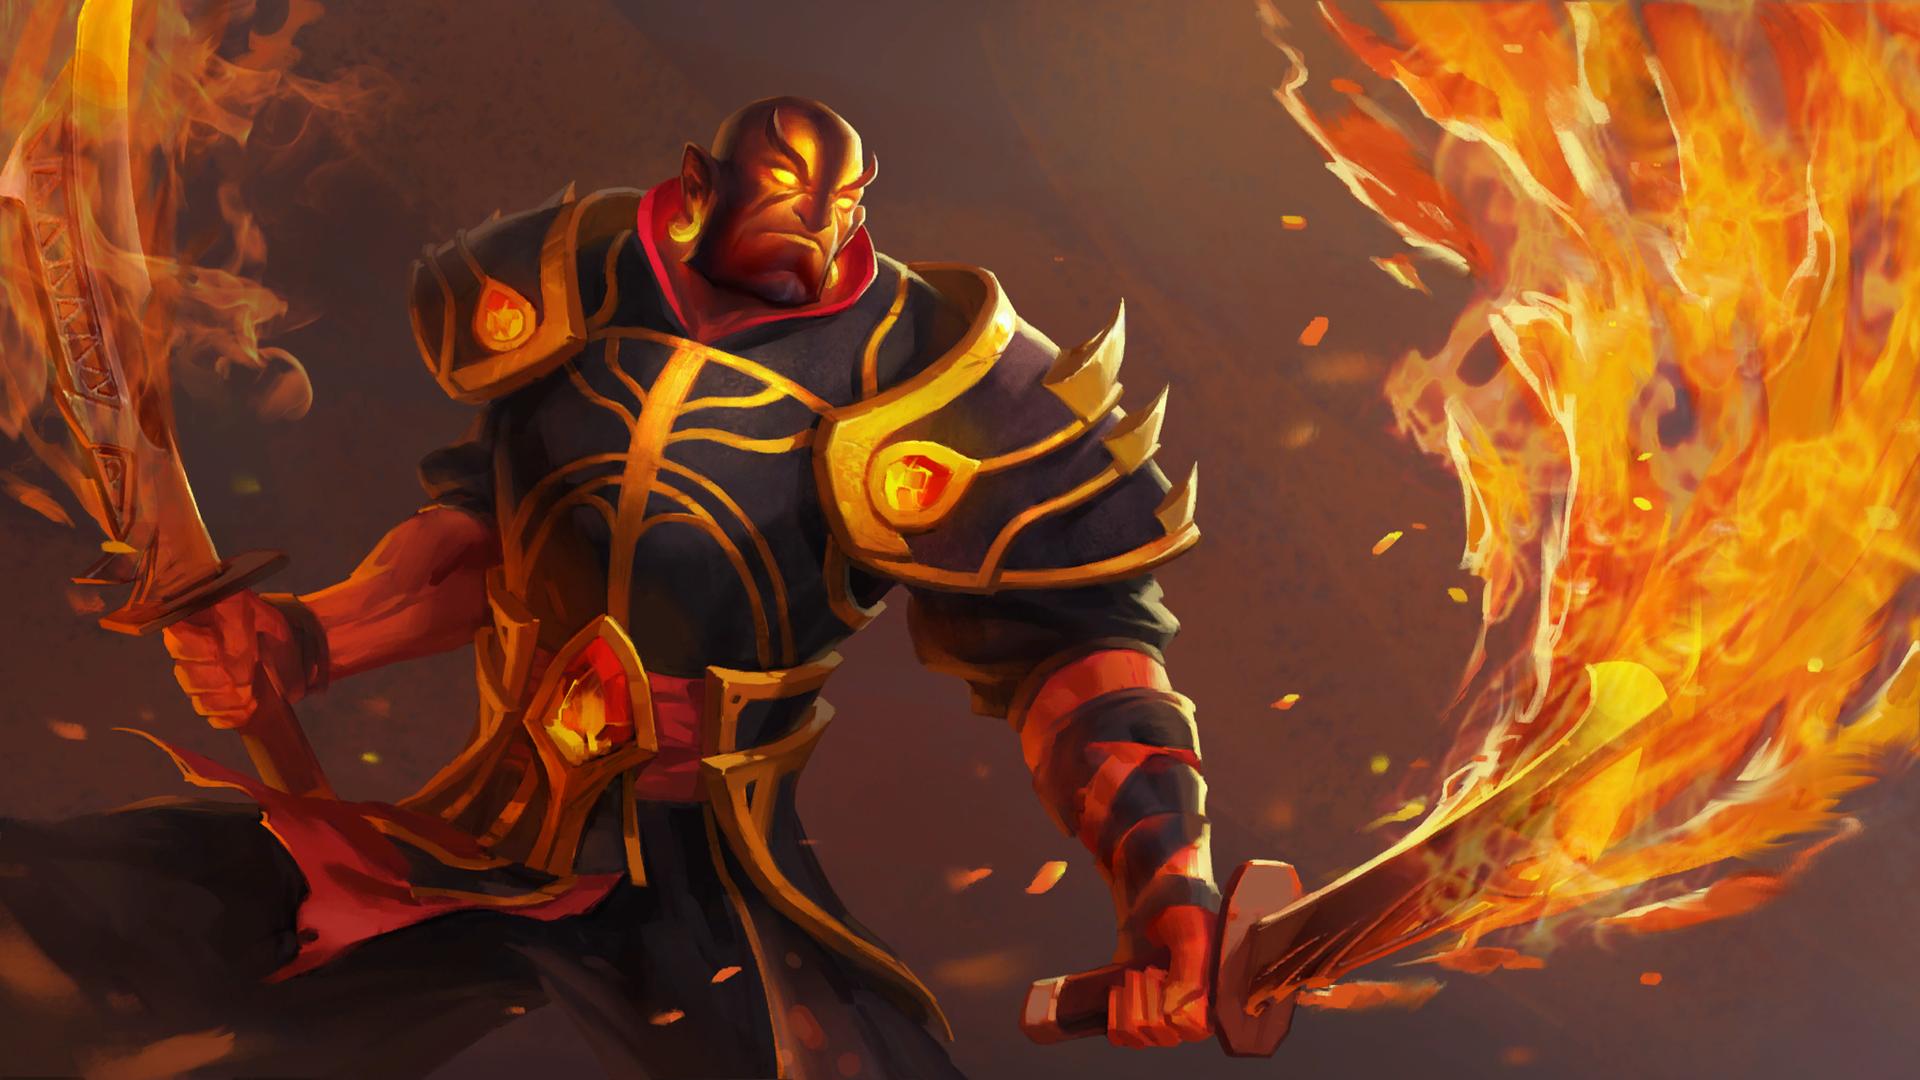 Dota 2 Ember Spirit hero guide: Strategy, tips, and tricks | Dot Esports